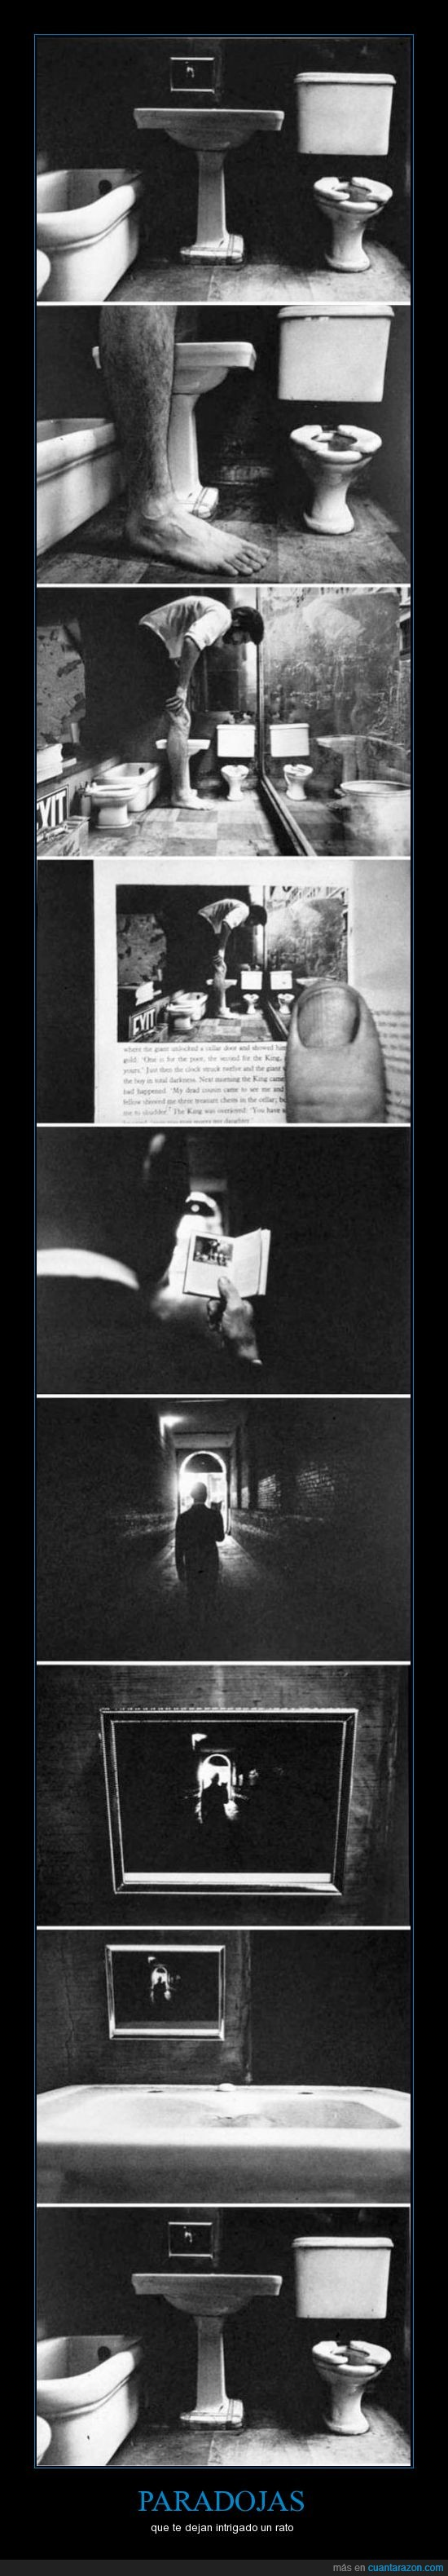 baño,dentro,foto,inception,libro,paranoia,persona